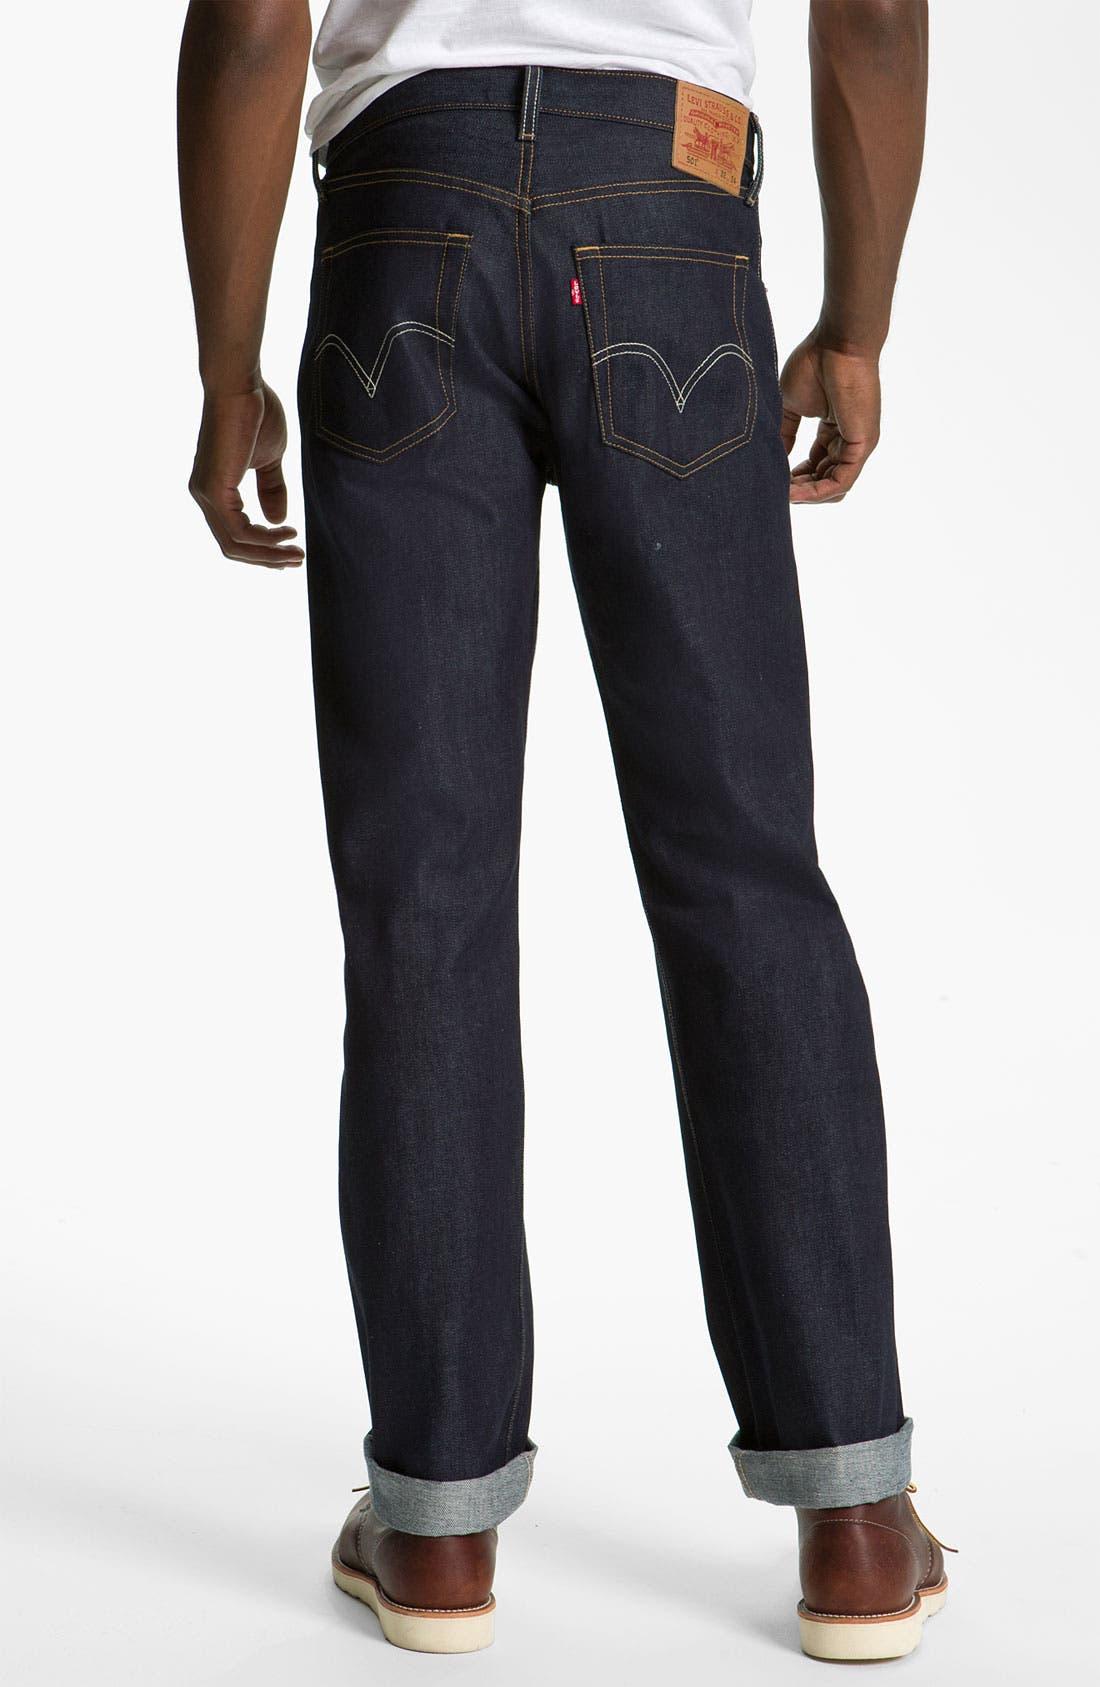 Alternate Image 1 Selected - Levi's '501®' Straight Leg Jeans (Rigid Selvedge)